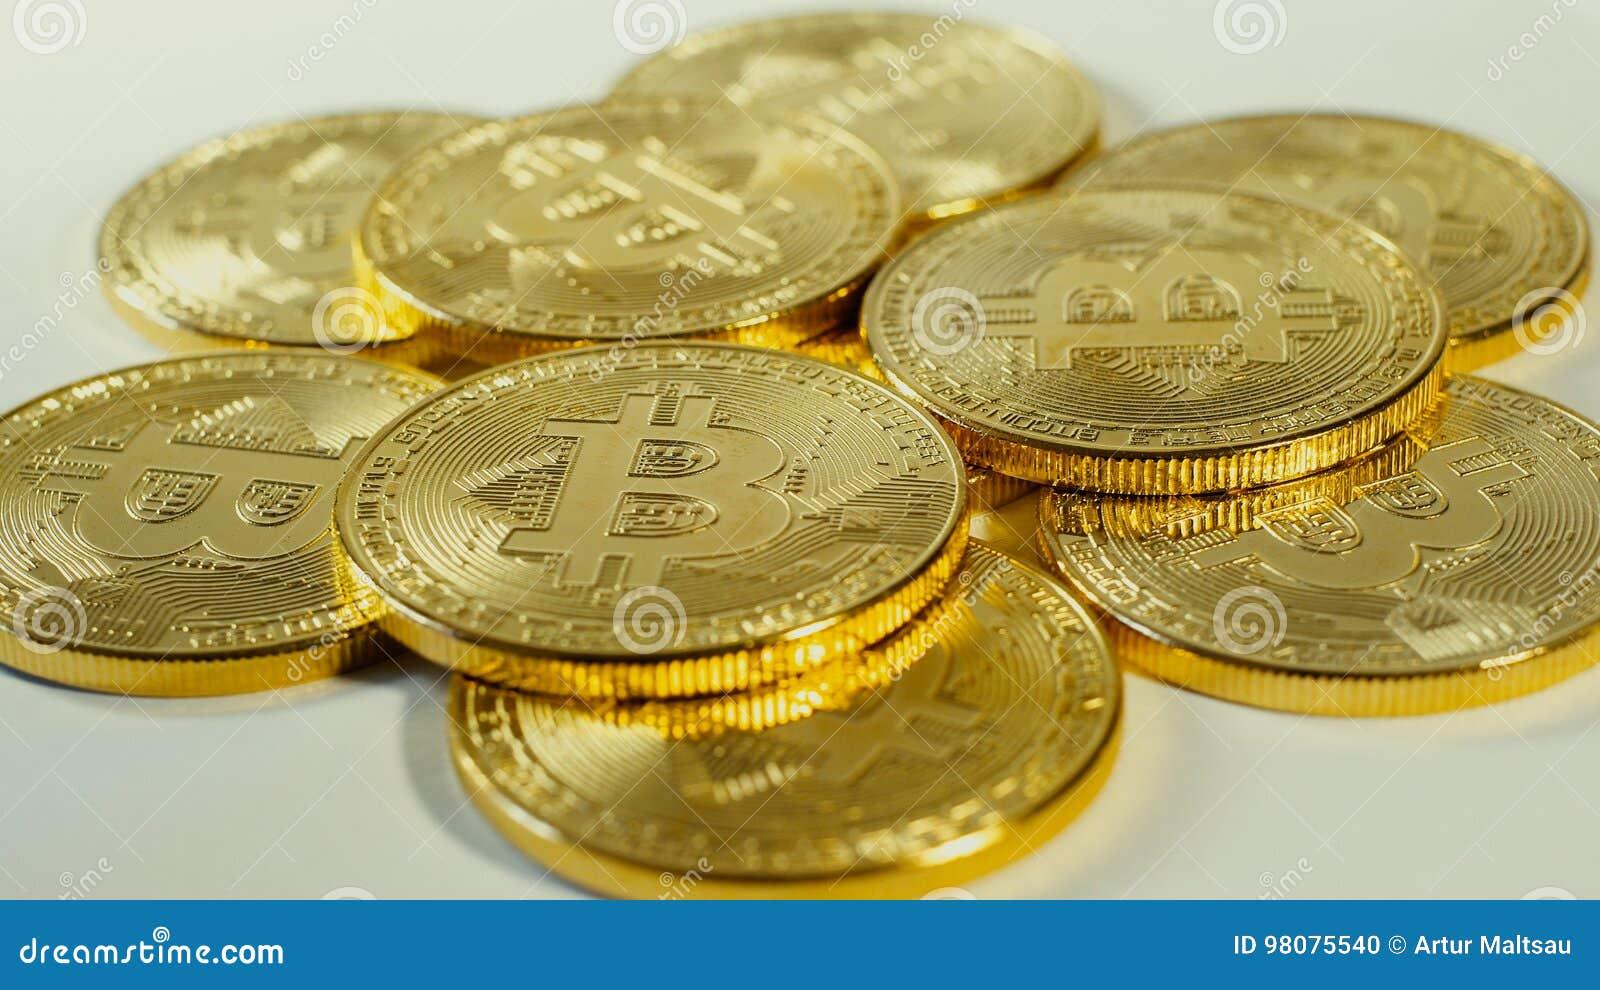 Crypto Currency Gold Bitcoins - BTC - Bit Coin  Macro Shots